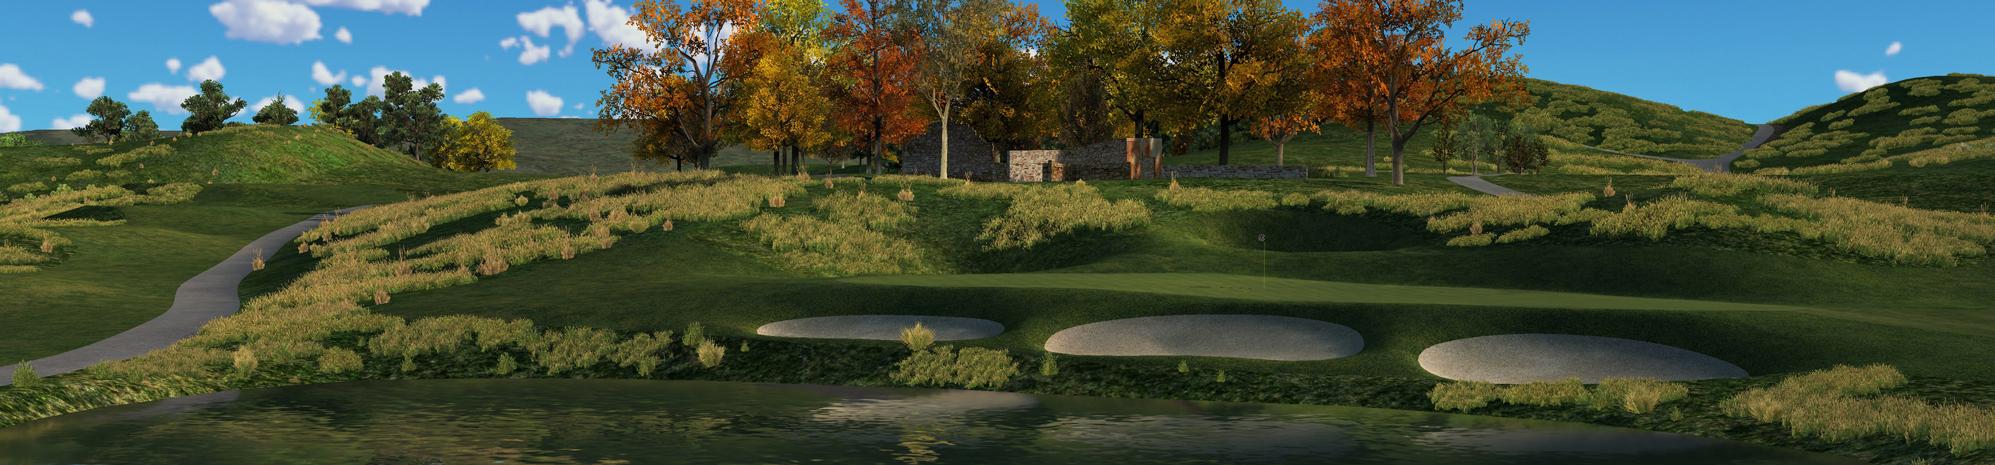 Par\'s Indoor Golf - Liverpool, NY